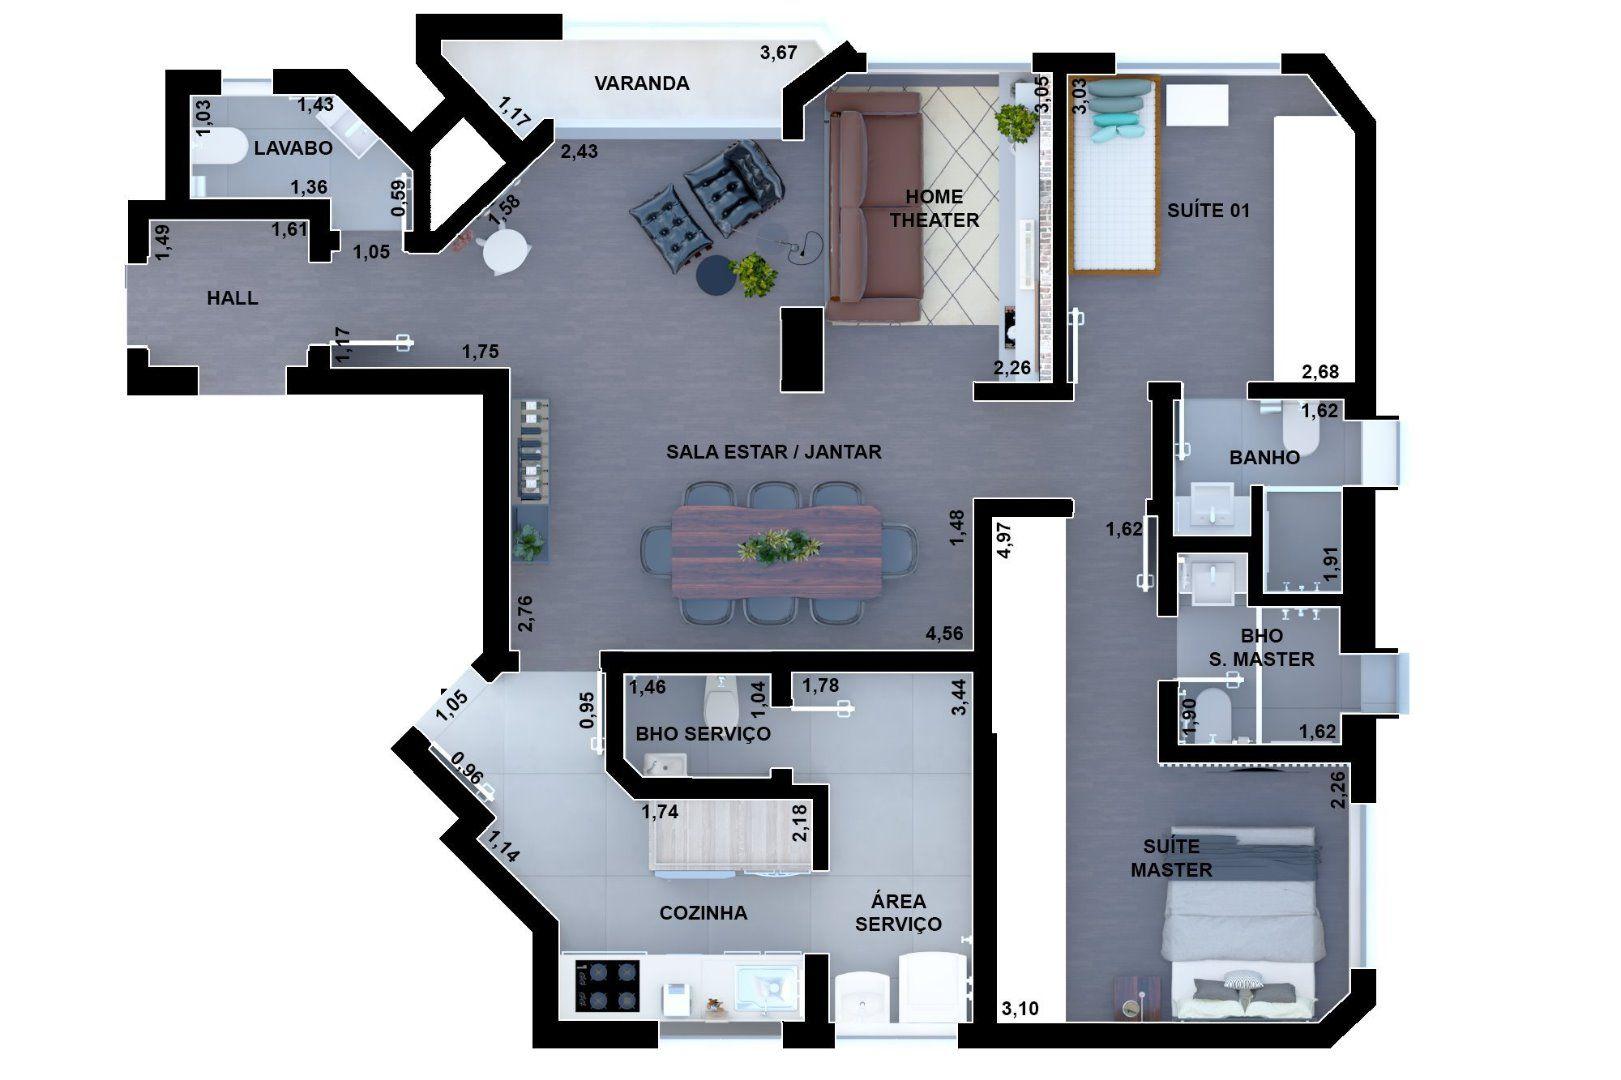 Planta do Edifício Monte Chenot. floorplan